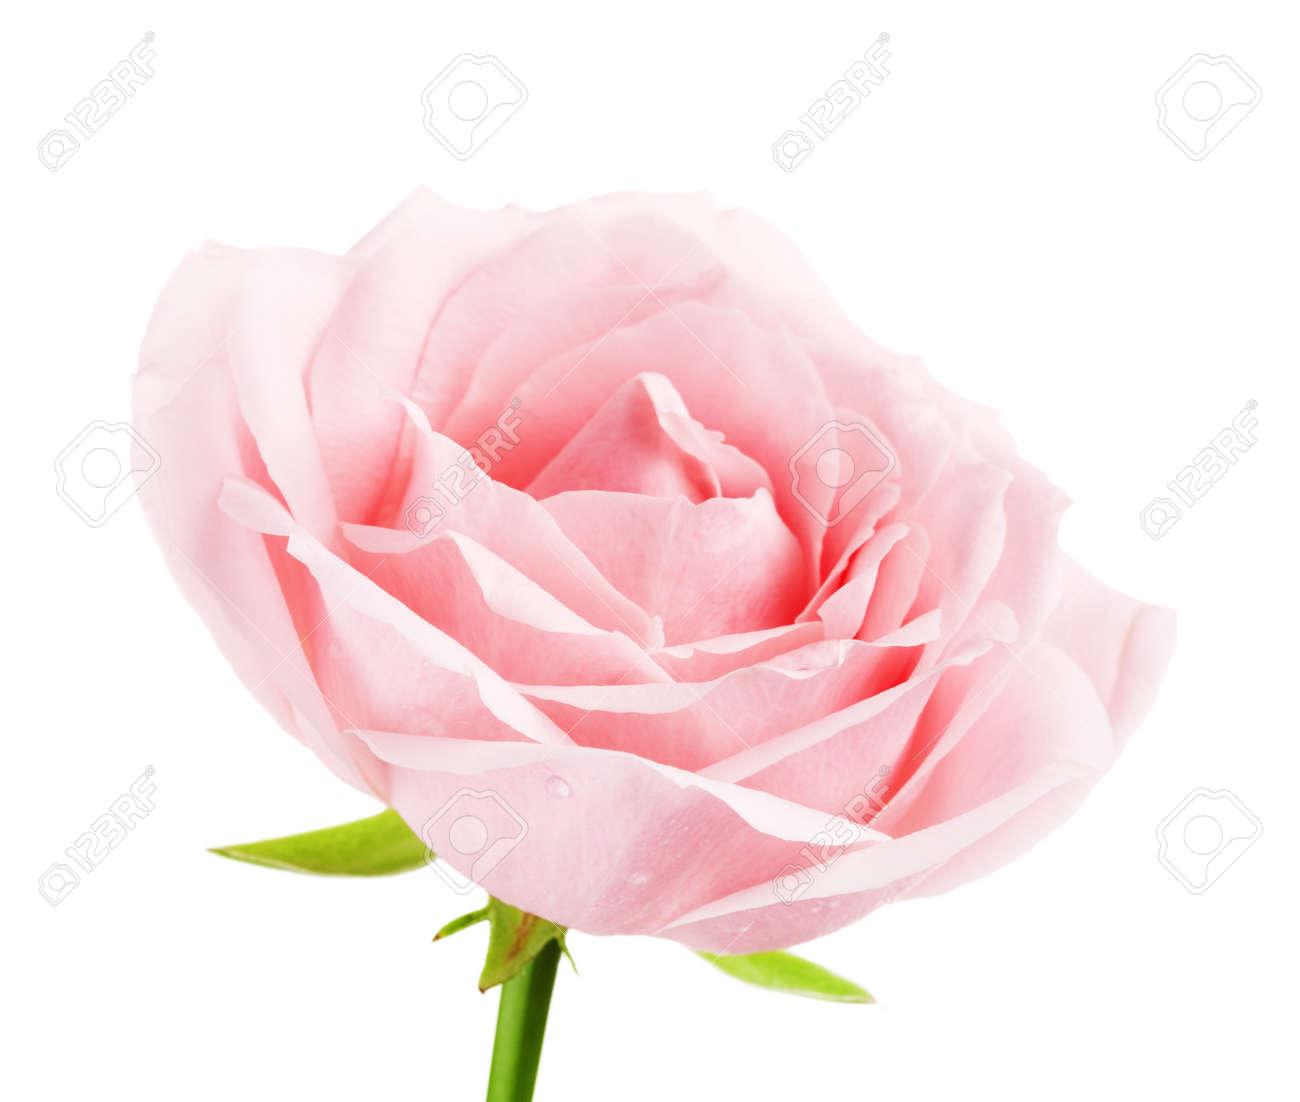 Single Pink Rose Flower Isolated On White Background Stock Photo